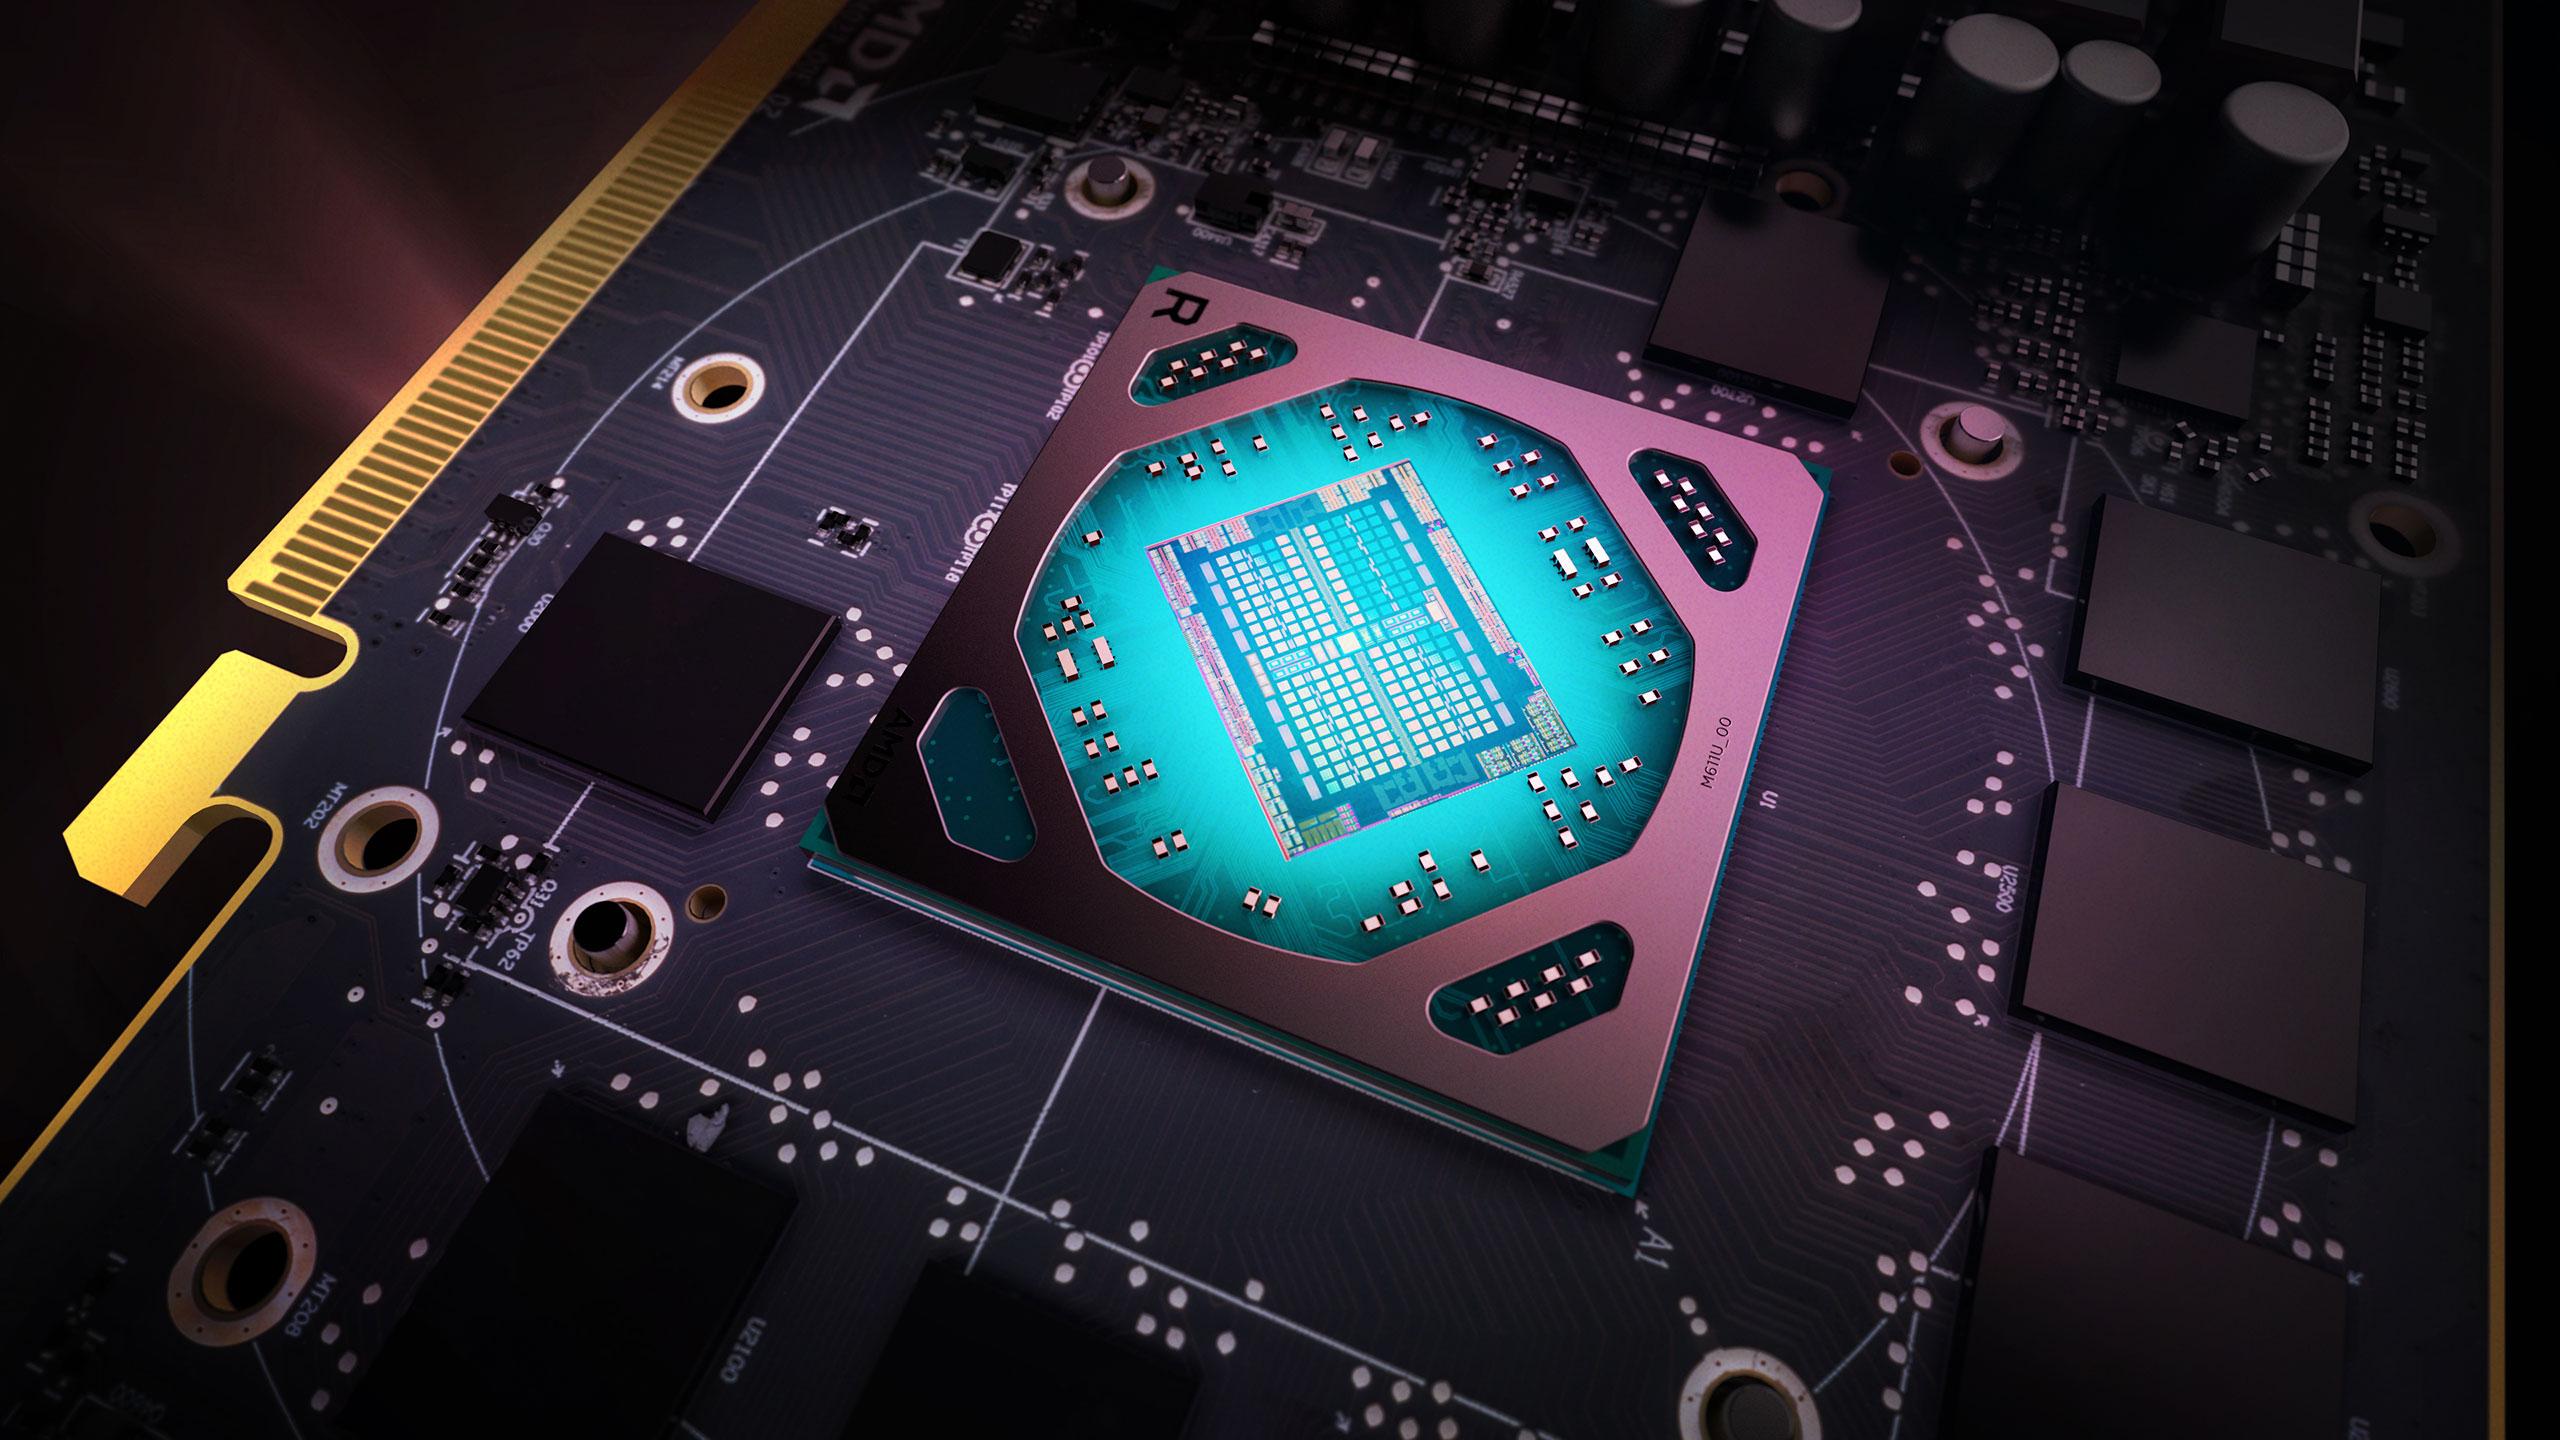 Amd Radeon Rx 590 Review Pc Gamer